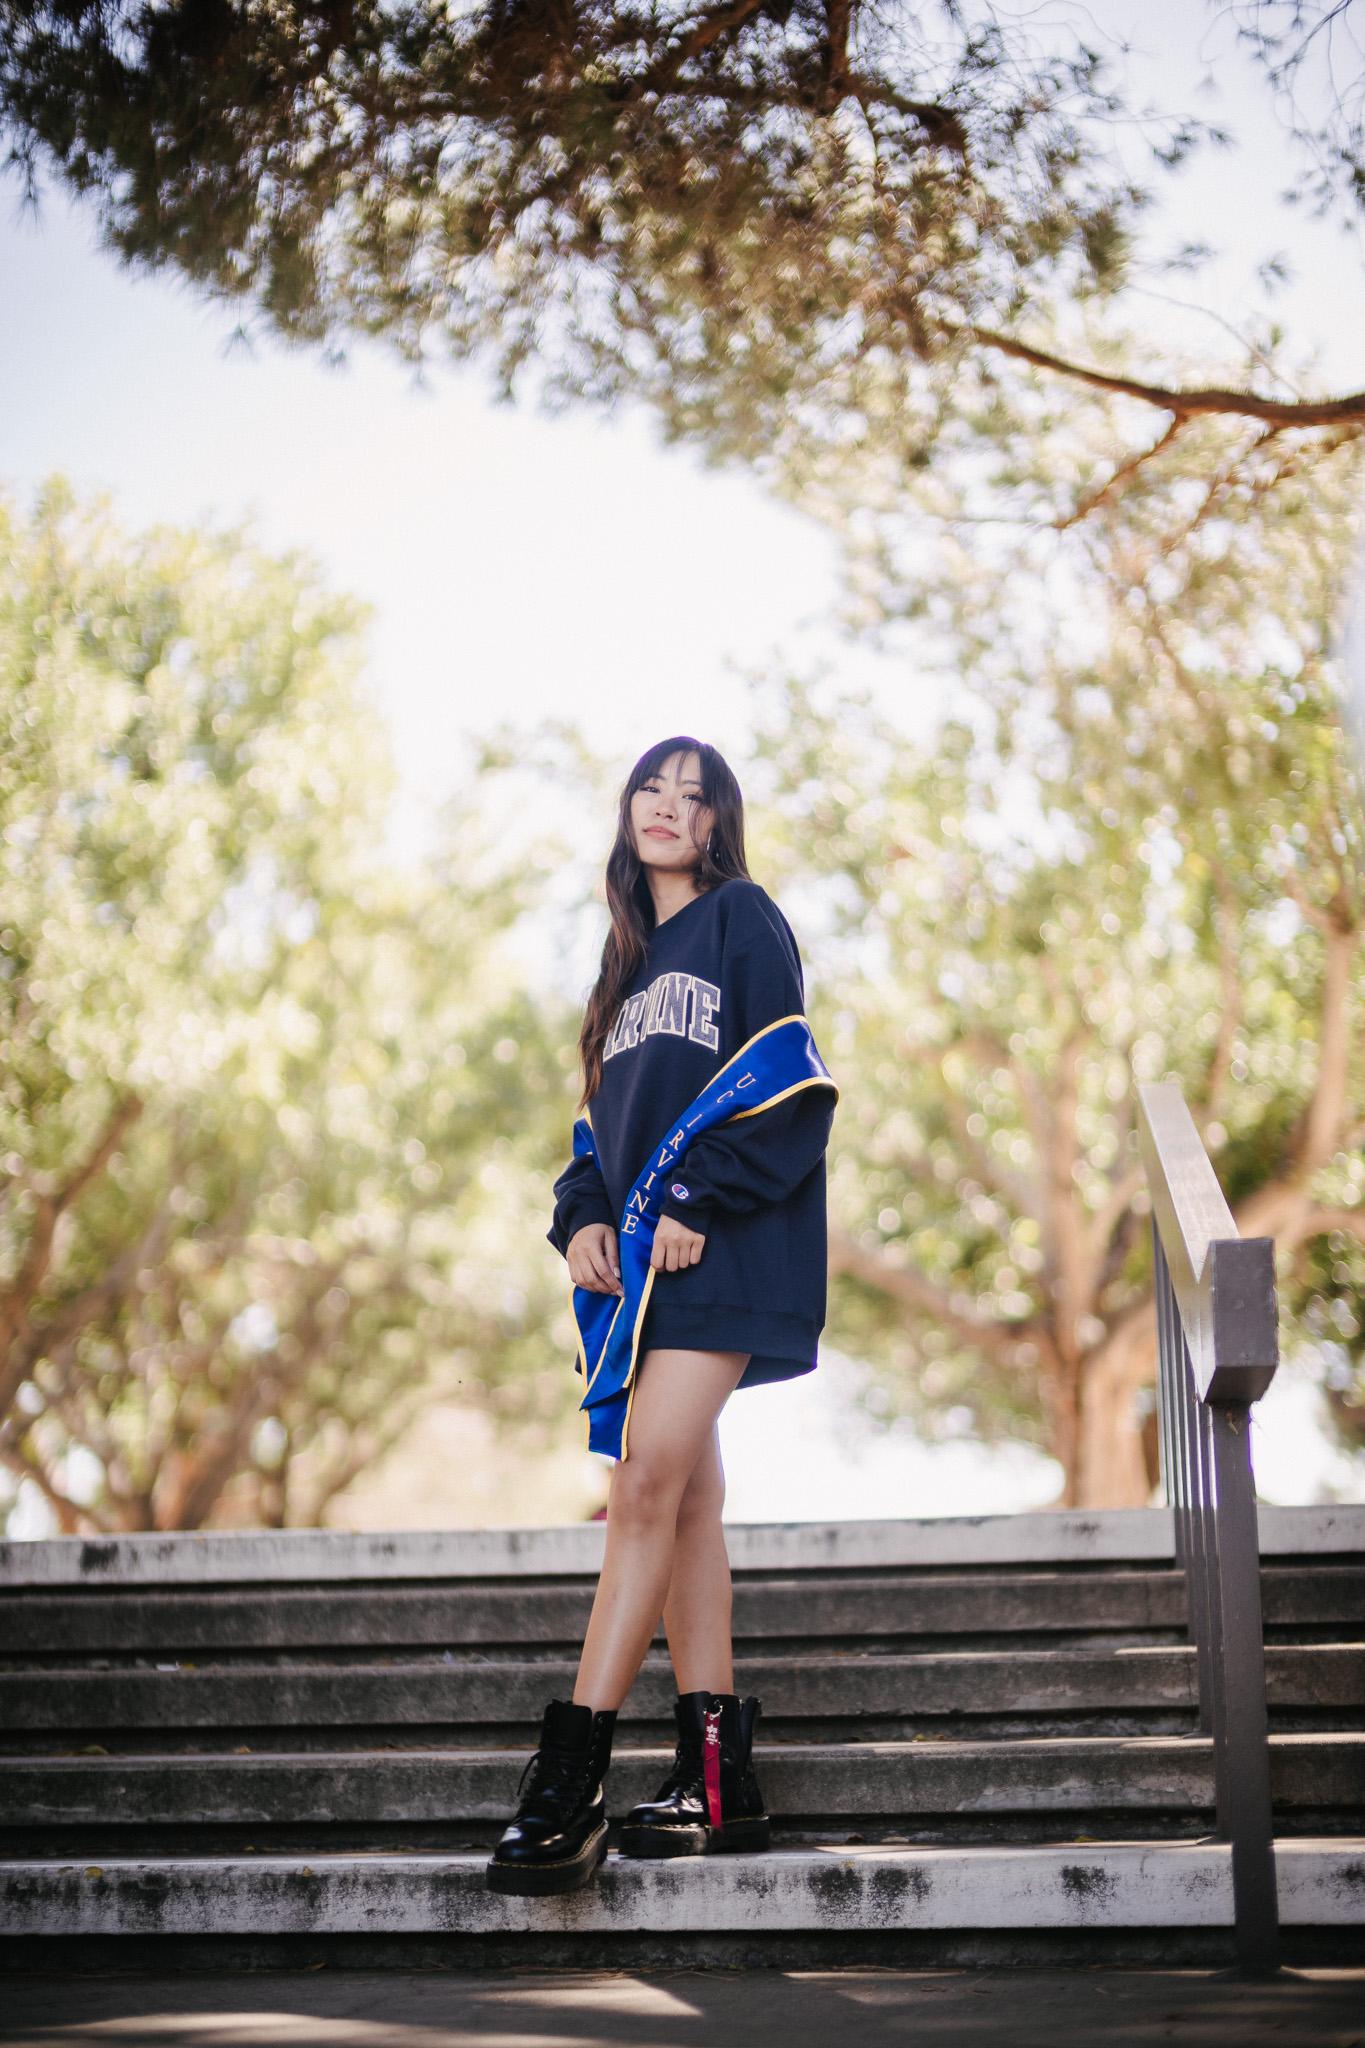 [5-16-2018] Vi's Graduation Photoshoot266.jpg